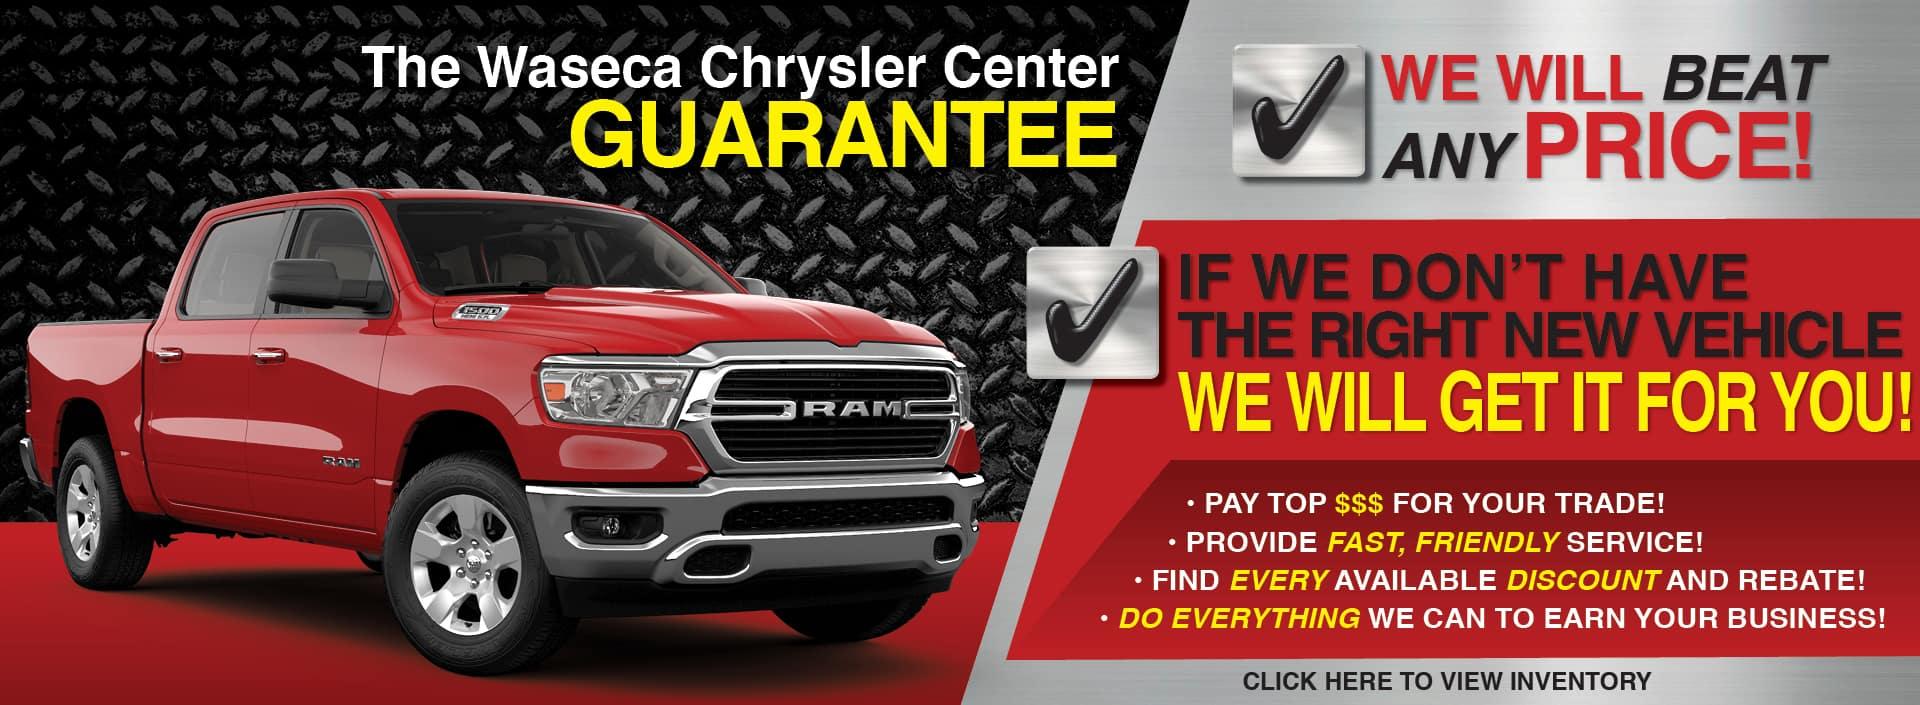 Waseca Chrysler Center Guarantee